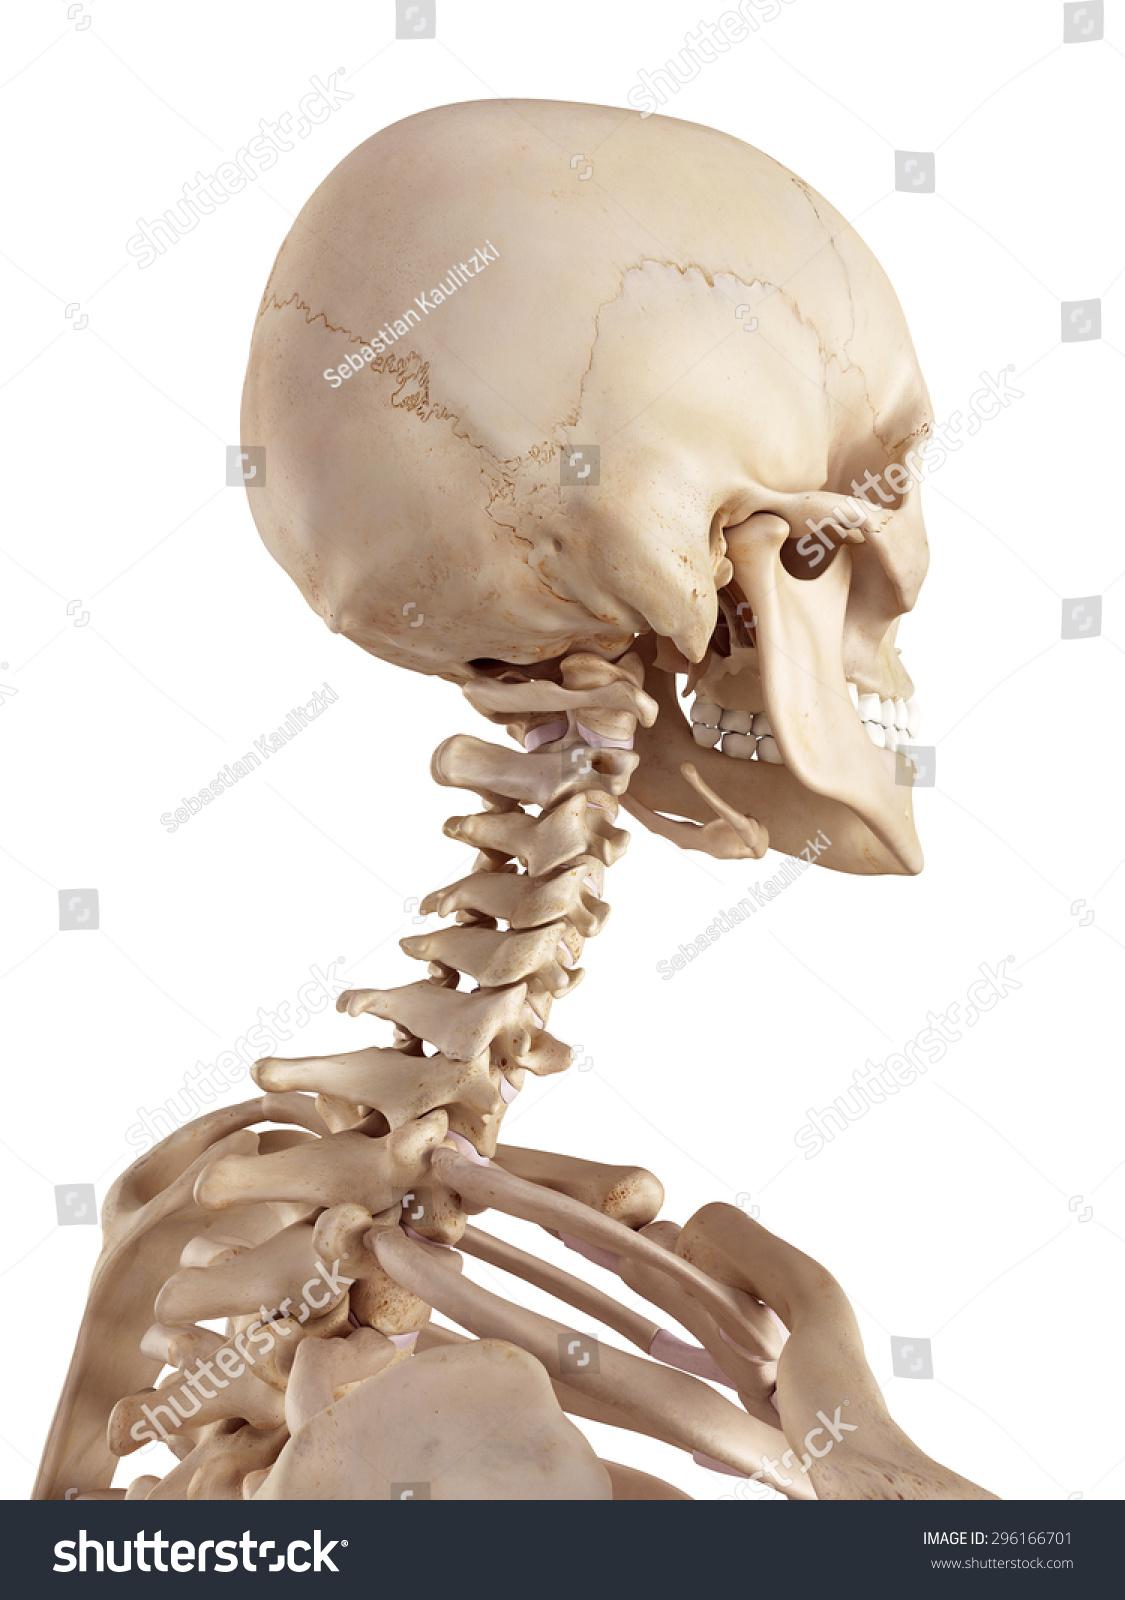 Medical Accurate Illustration Human Skull Neck Stock Illustration